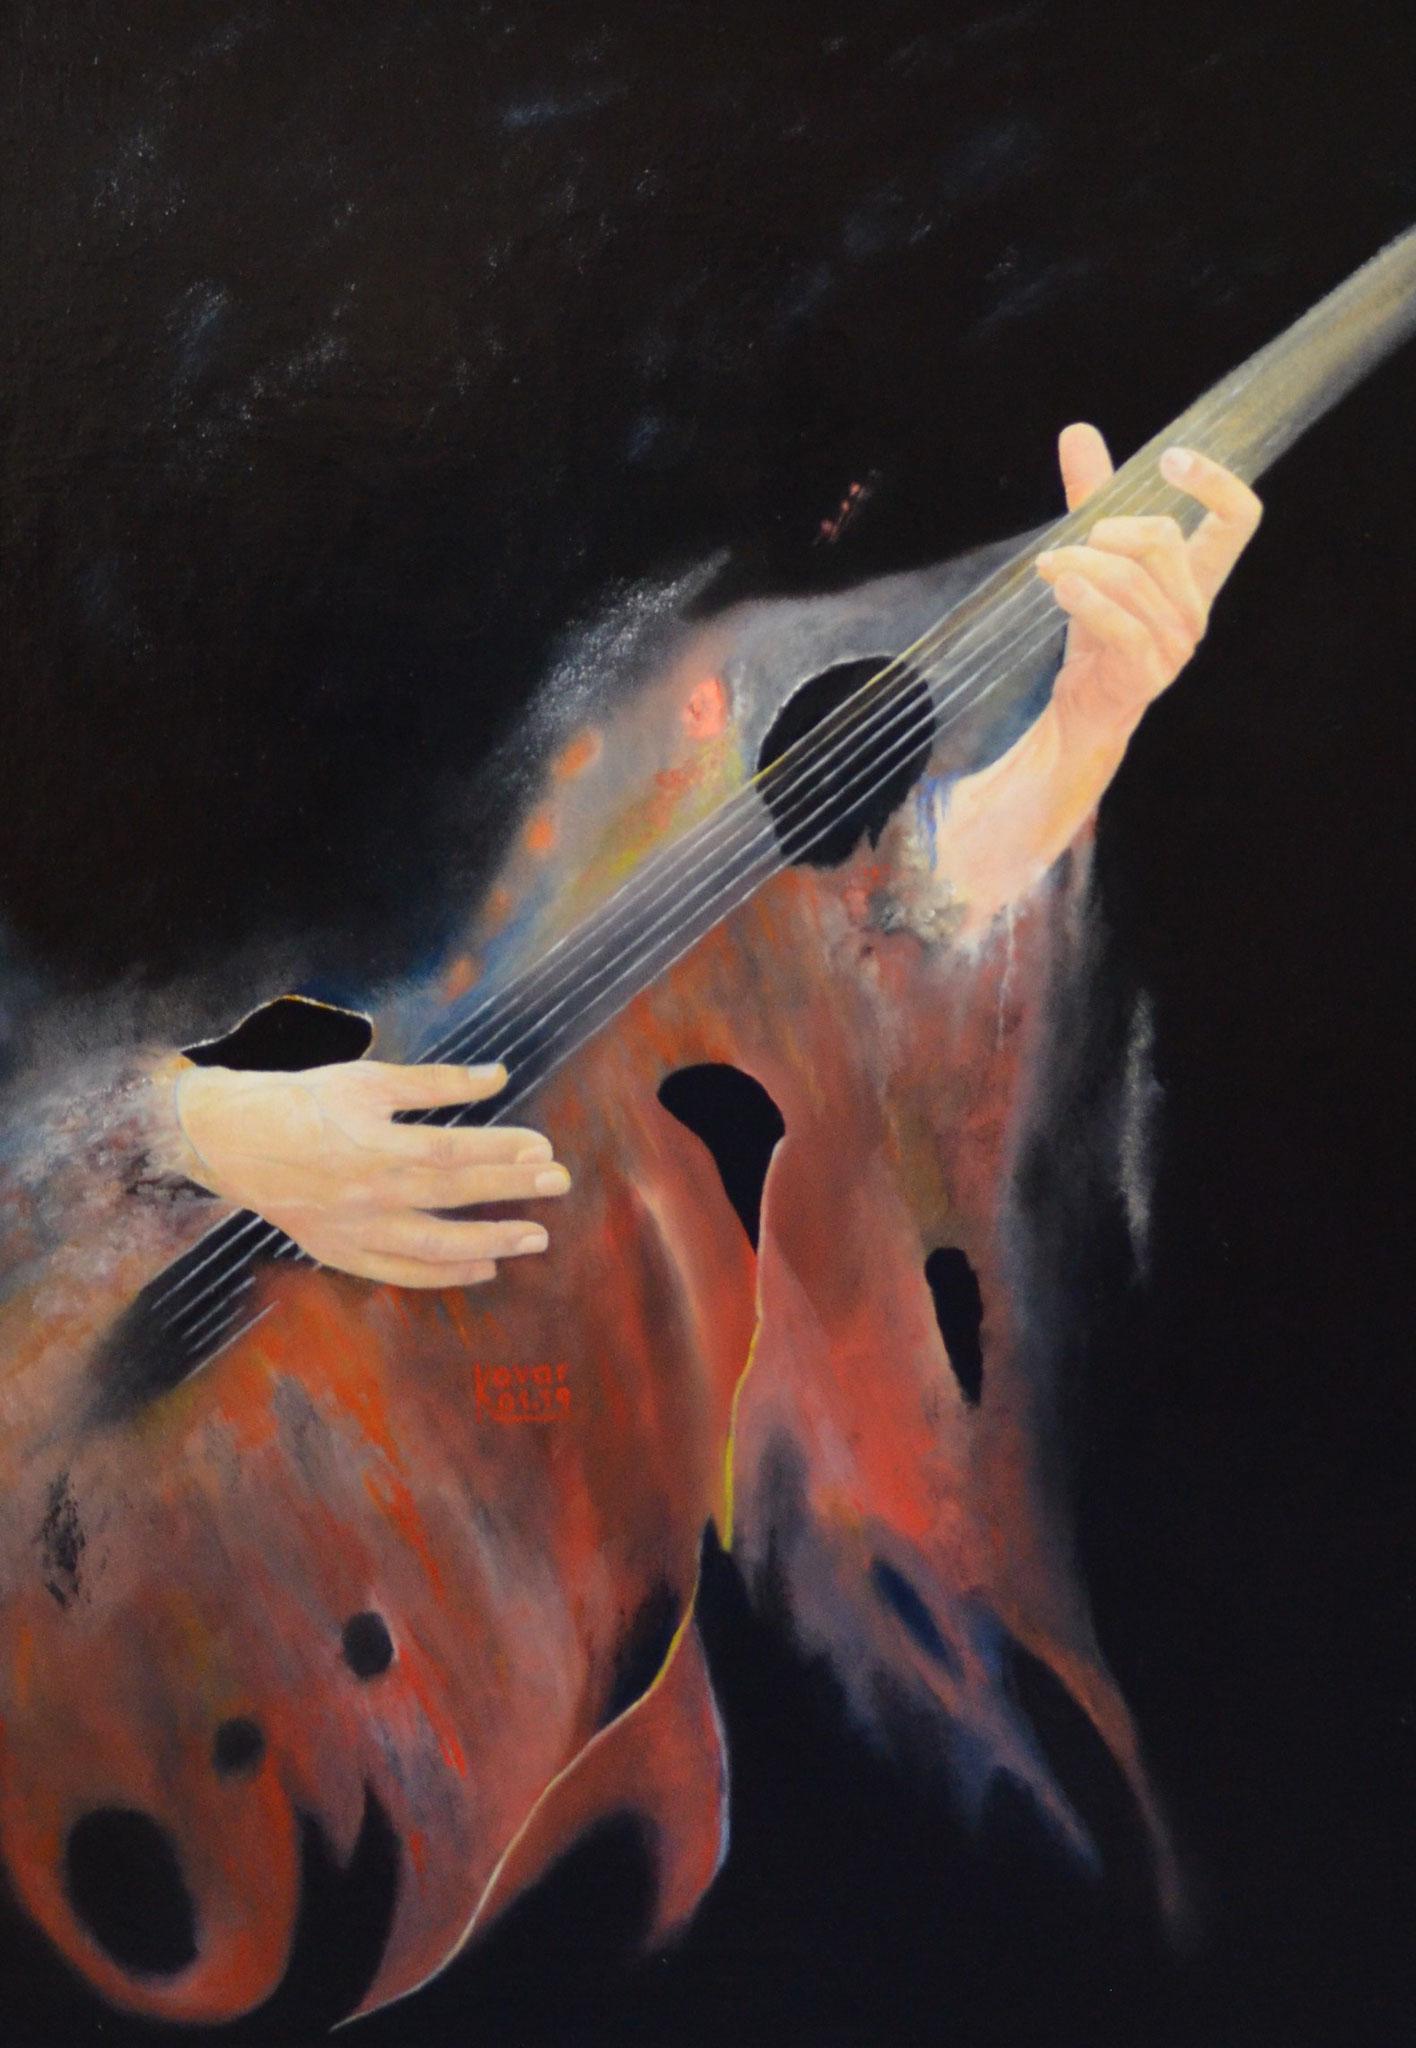 Gitarrist / Guitarist, Öl auf Leinwand 50 x 70cm, 2019. Oil on canvas.